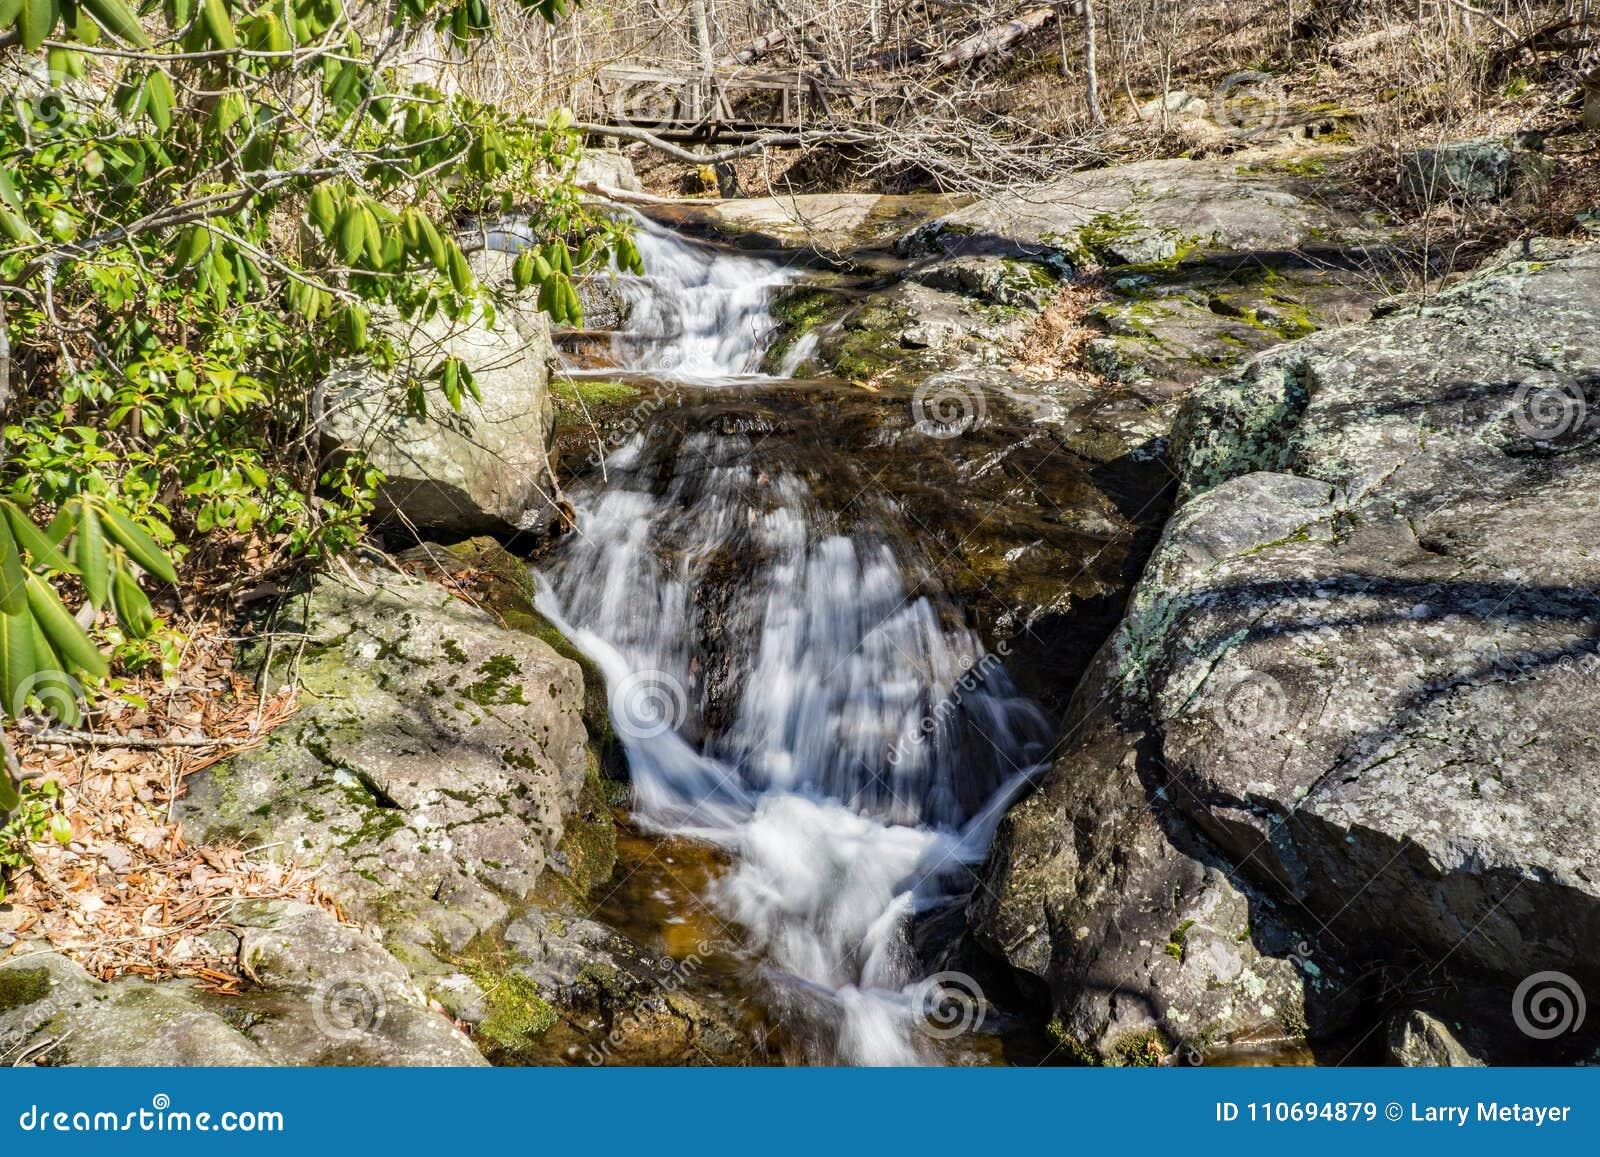 Fallingwater Cascades – Horizontal View